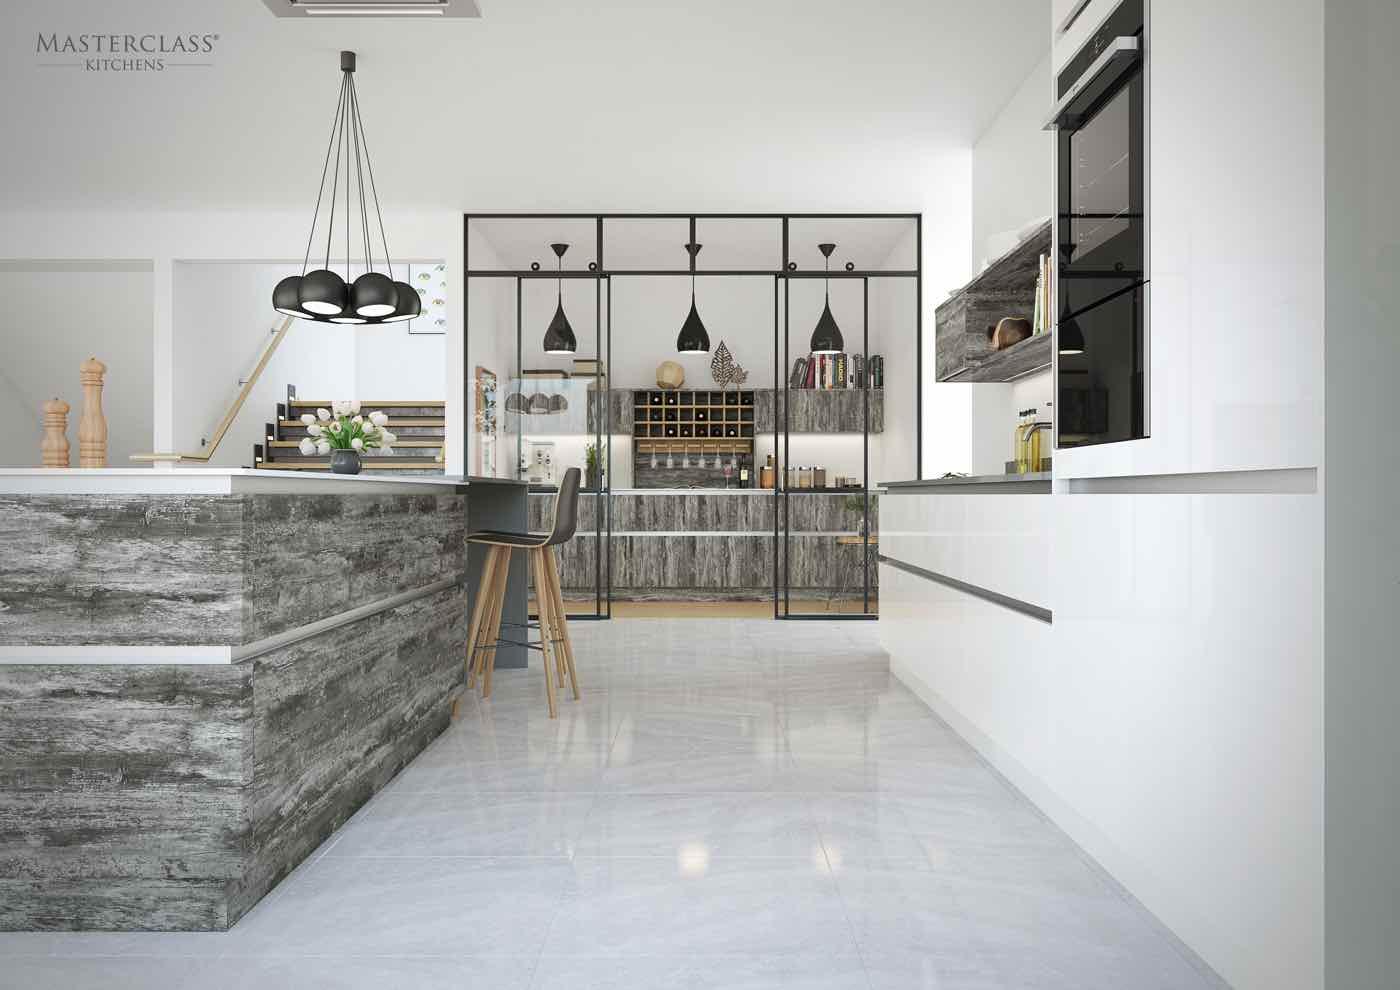 H Line Deco masterclass kitchens